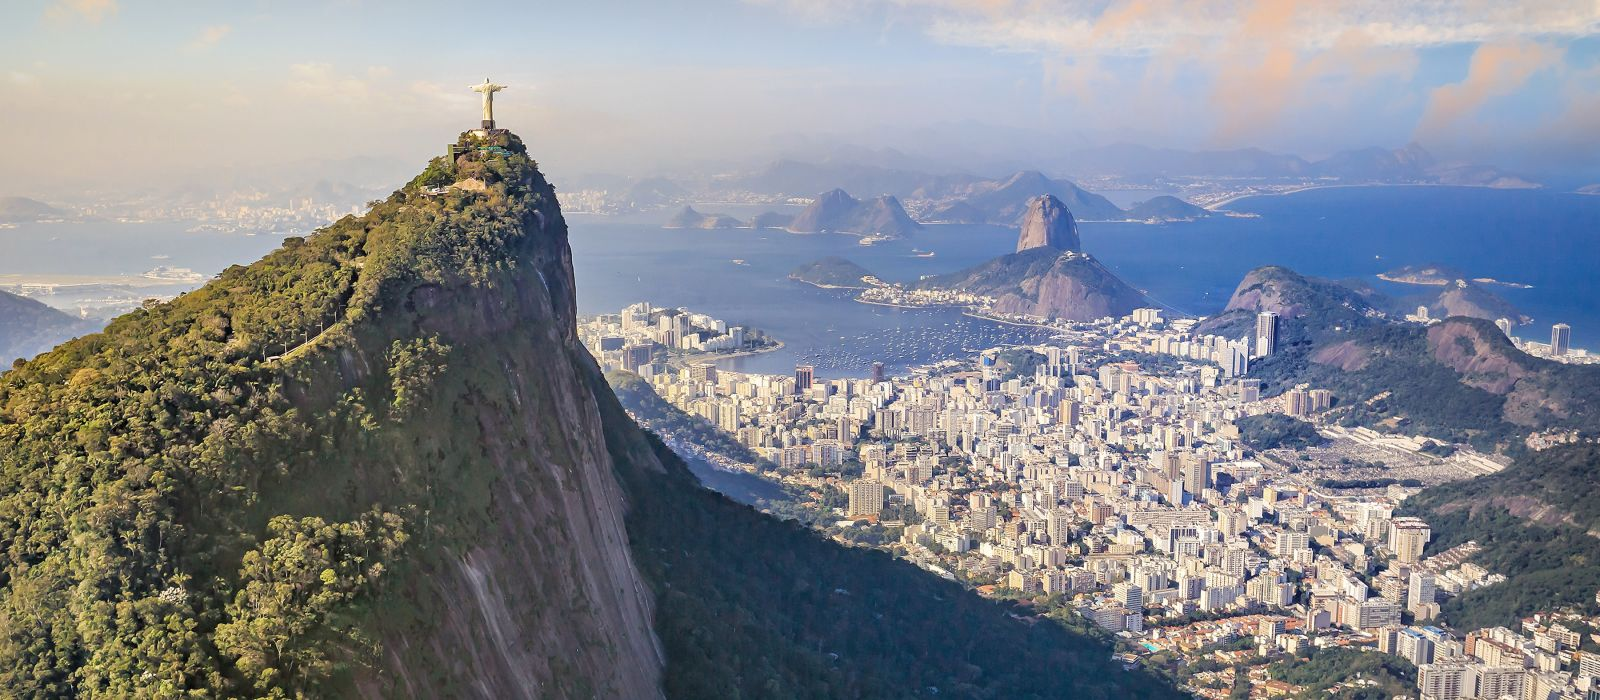 Aerial view of Rio de Janeiro city skyline in Brazil, South America